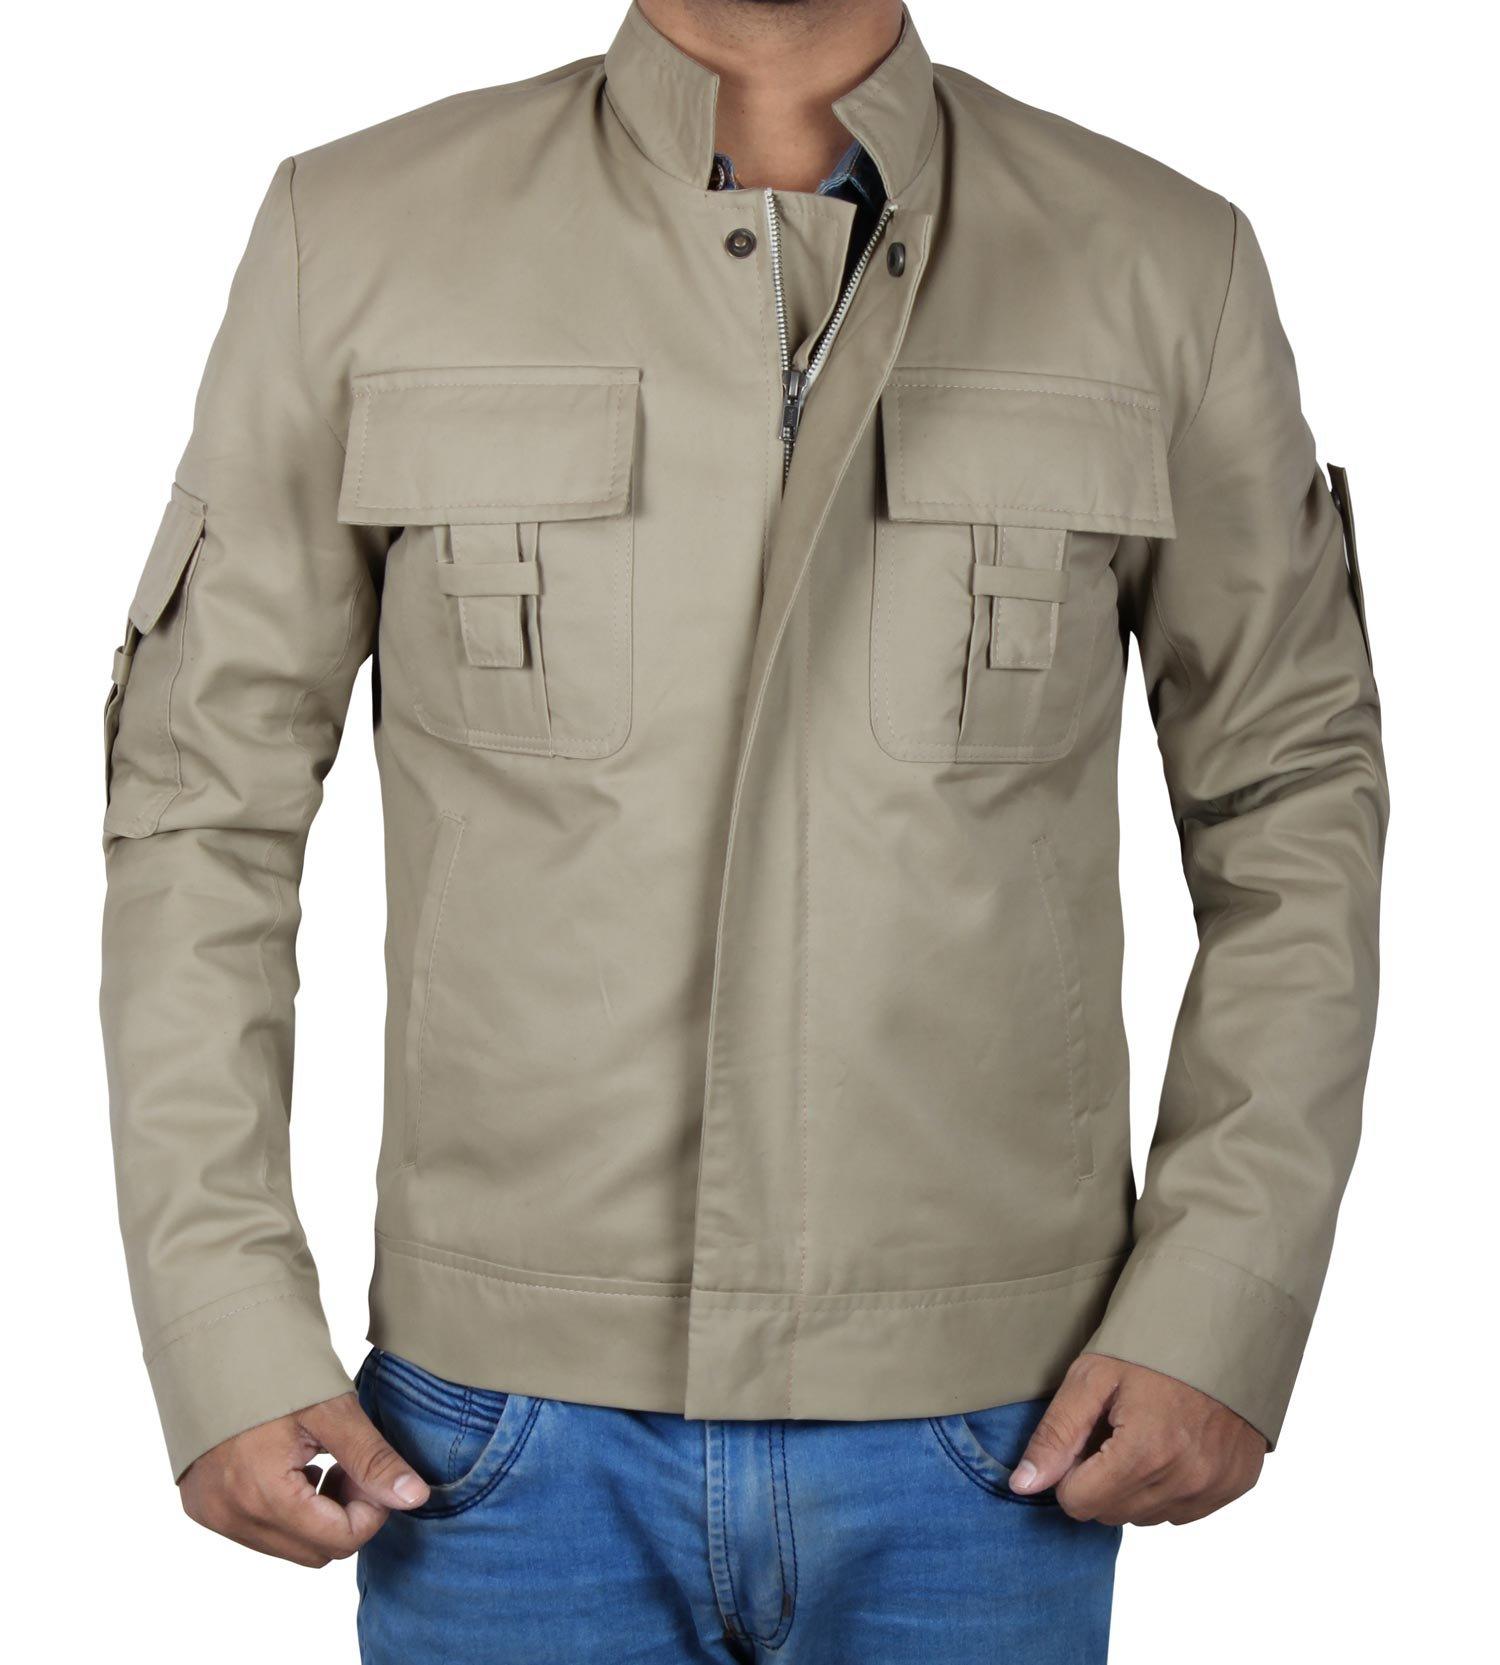 Mens Skywalker Cotton Jacket | Mens Cotton Jackets For Summer | Beige Luke Skywalker Jacket, 2XL